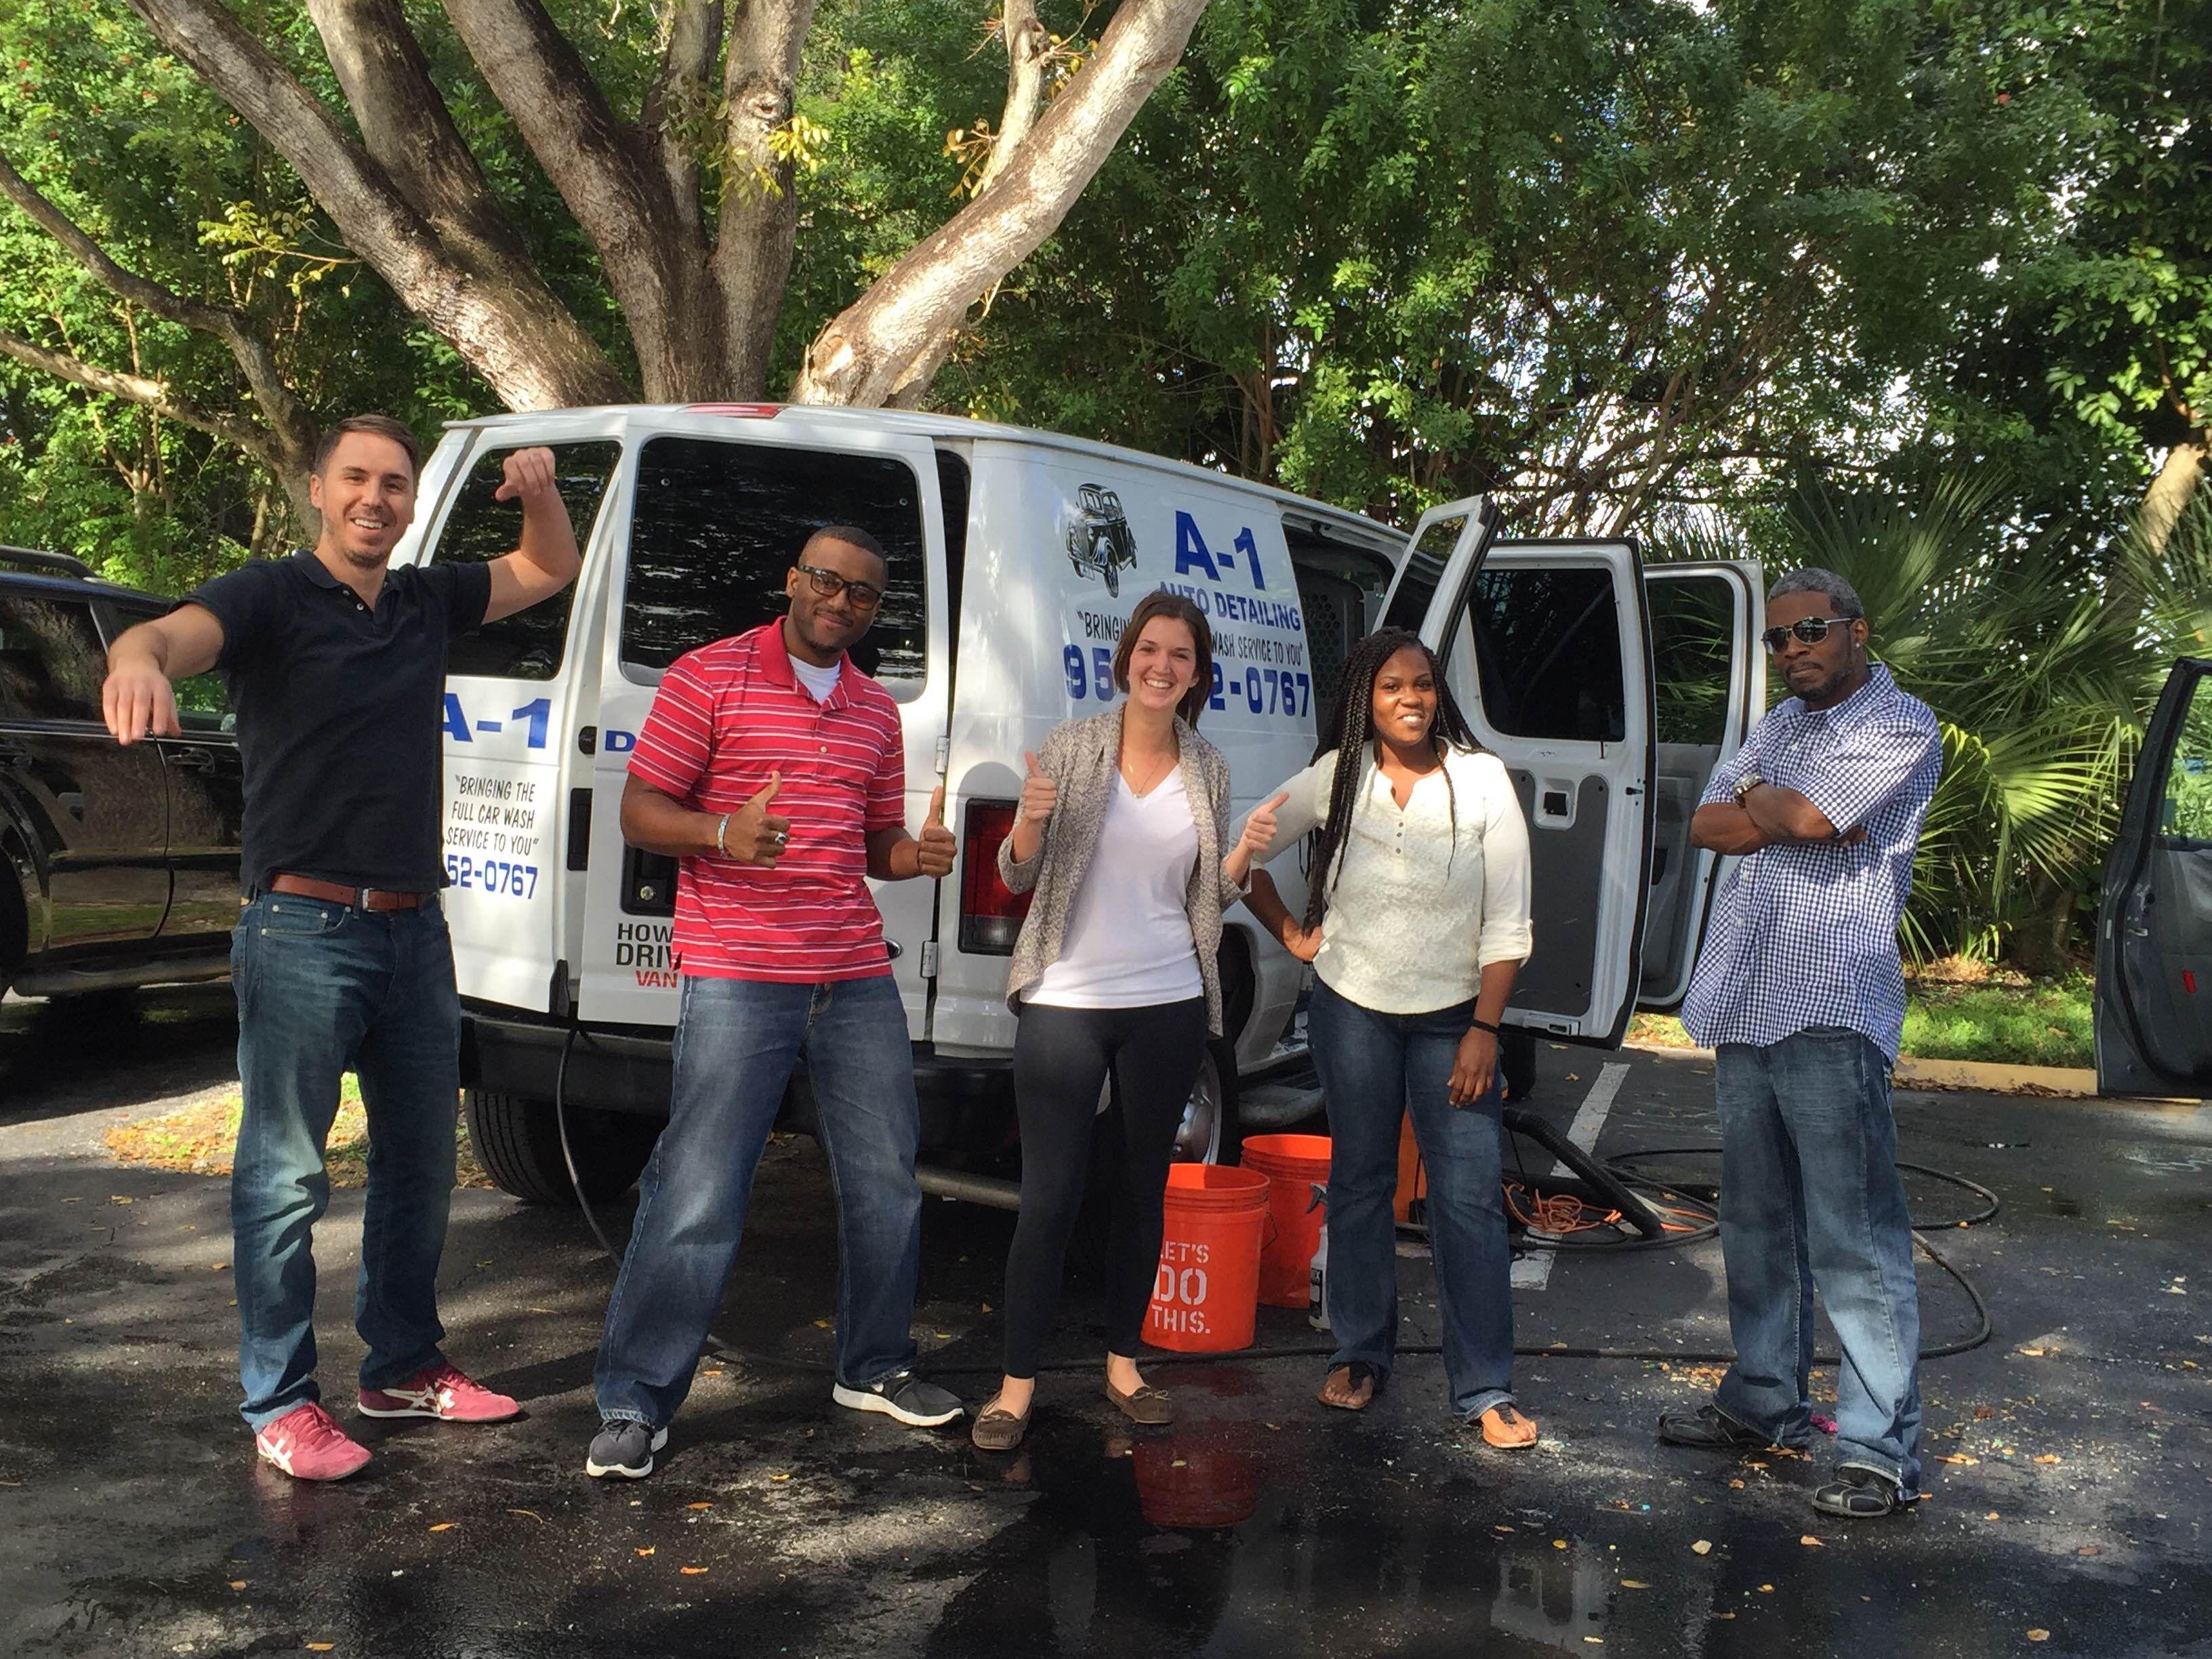 #RandMarketing management rewarded their employees hard work with a free car wash!